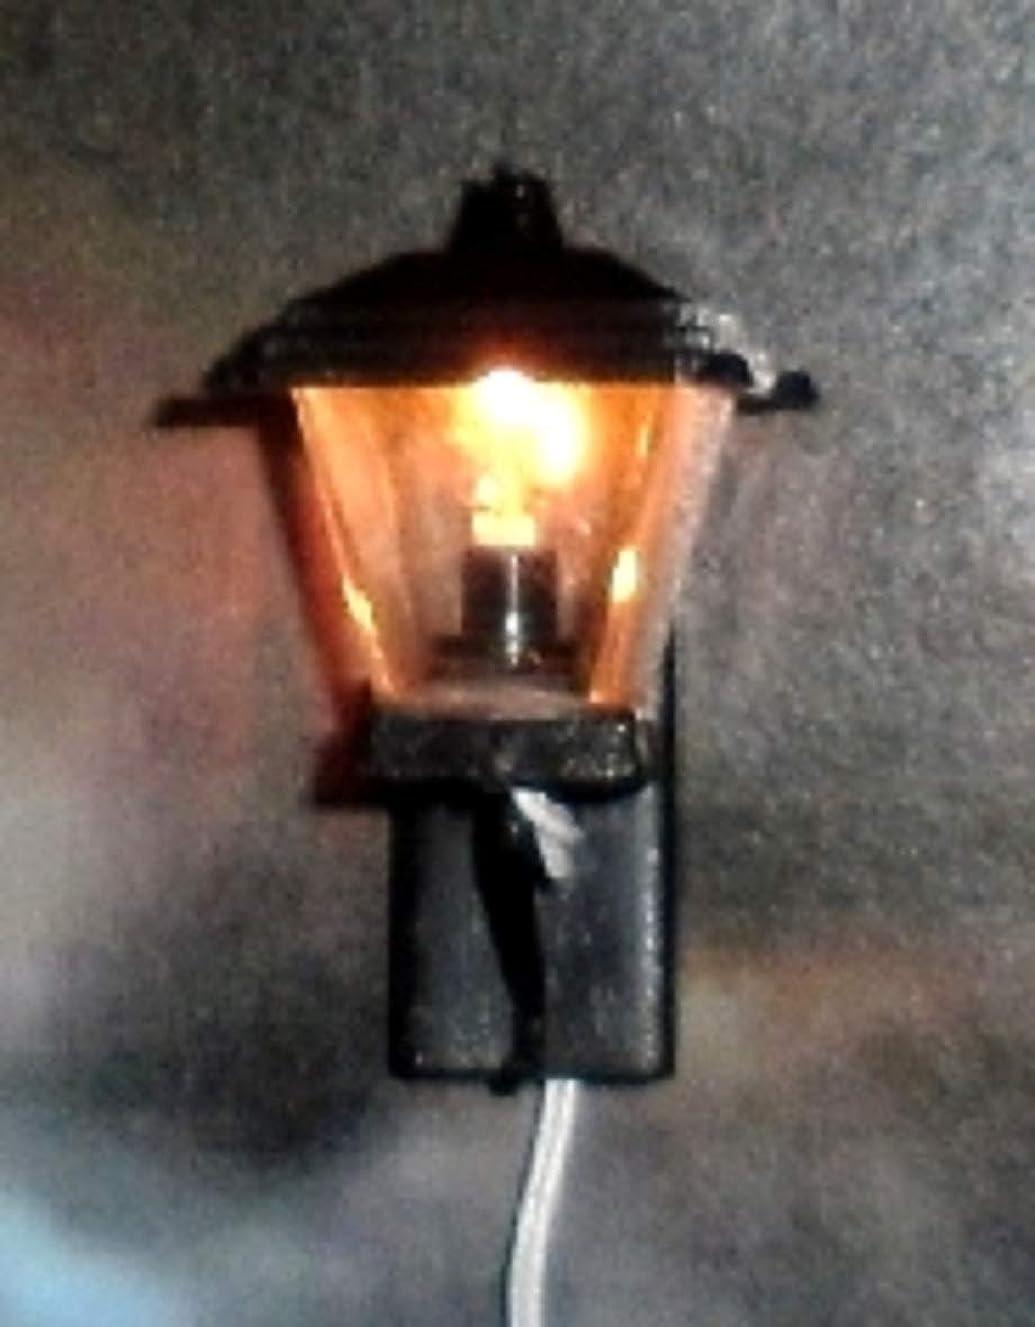 Melody Jane Dollhouse Modern Garden Light Lantern Miniature 12V Electric Lighting Black